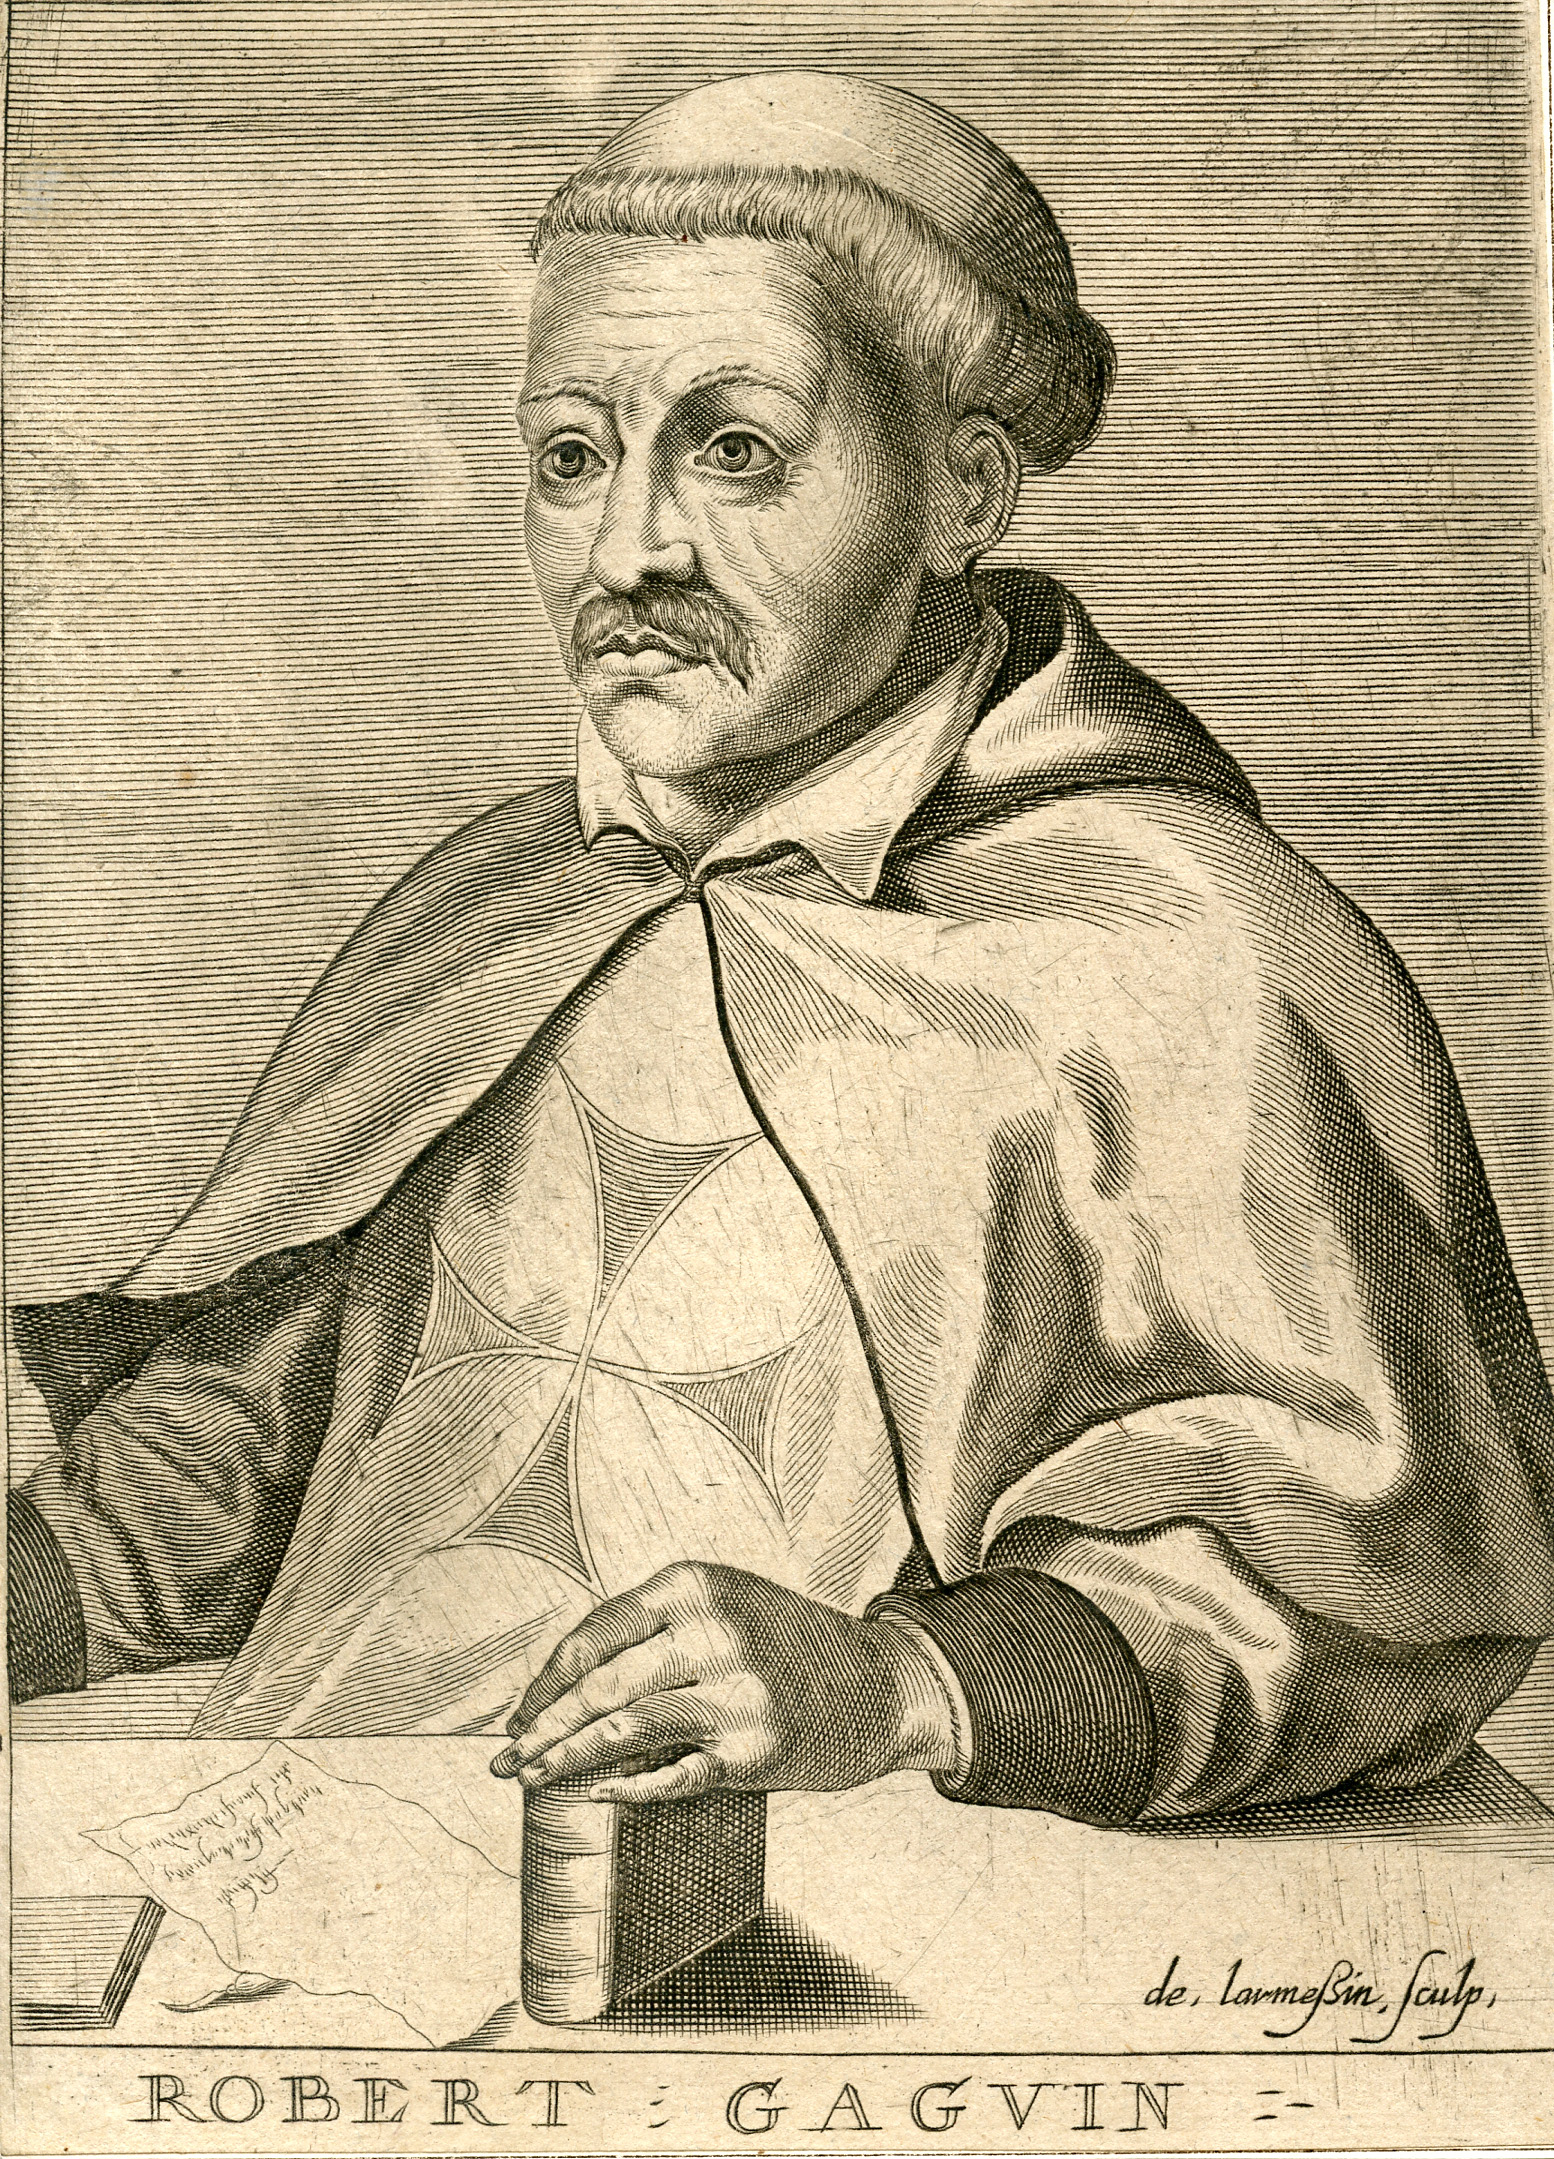 Robert Gaguin; 17th century engraving by Nicolas III de Larmessin